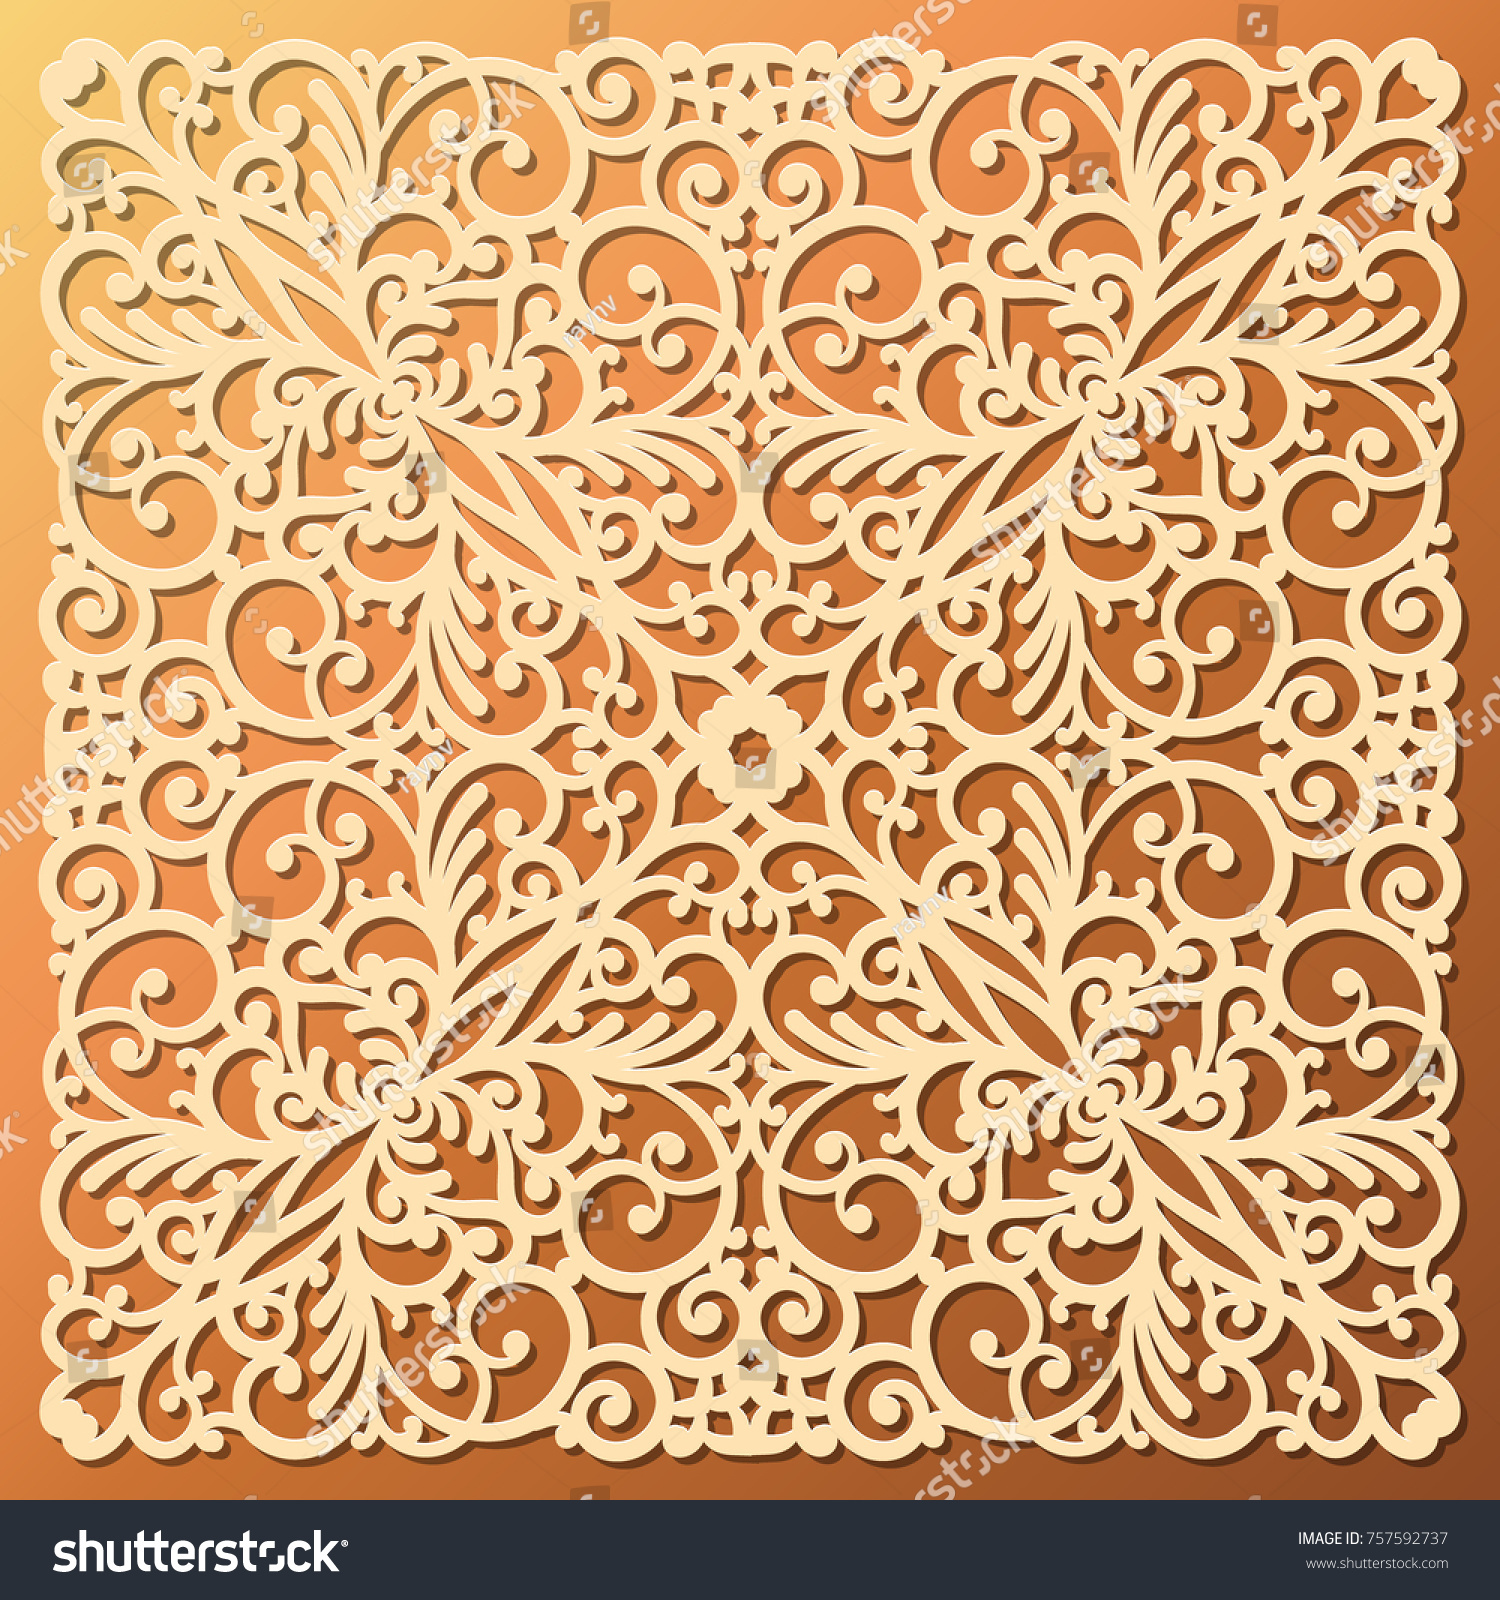 Laser Die Cut Ornamental Square Pattern Stock Vector 757592737 ...